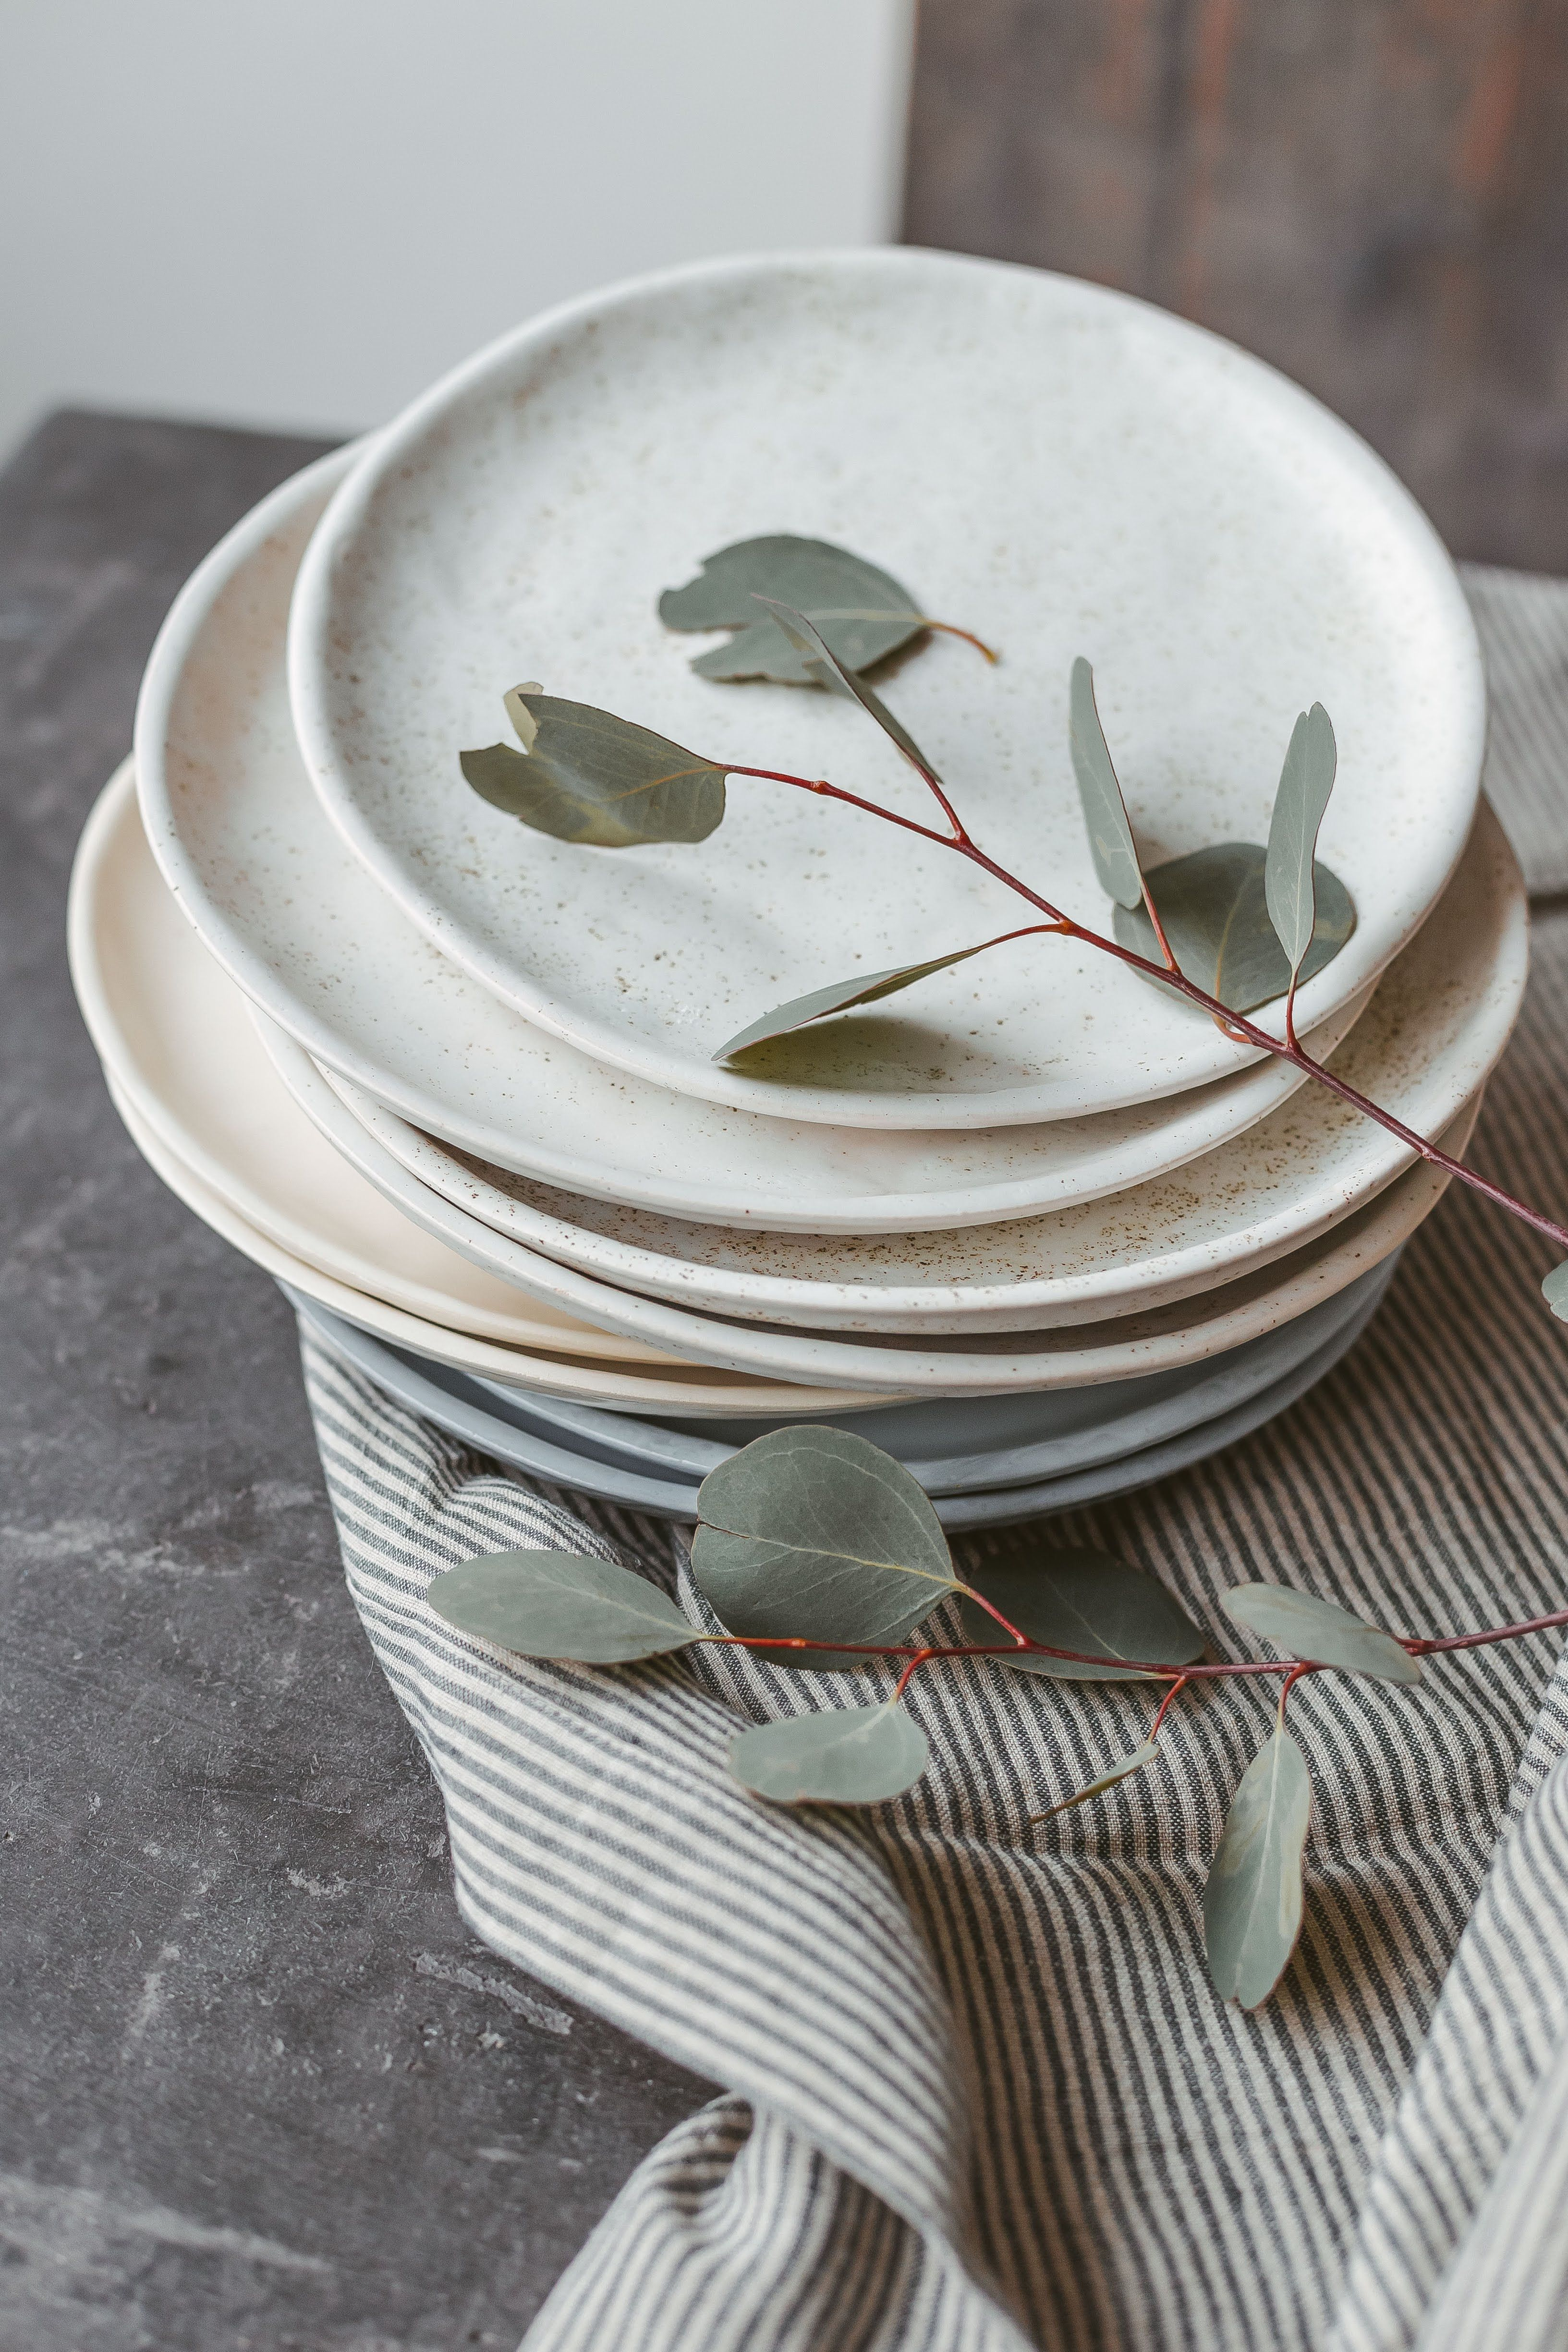 Handmade pottery tableware Handmade ceramic dishes Handmade ceramic plates  #Handmadepottery #tableware #Handmadeceramics #dishes #ceramicplates